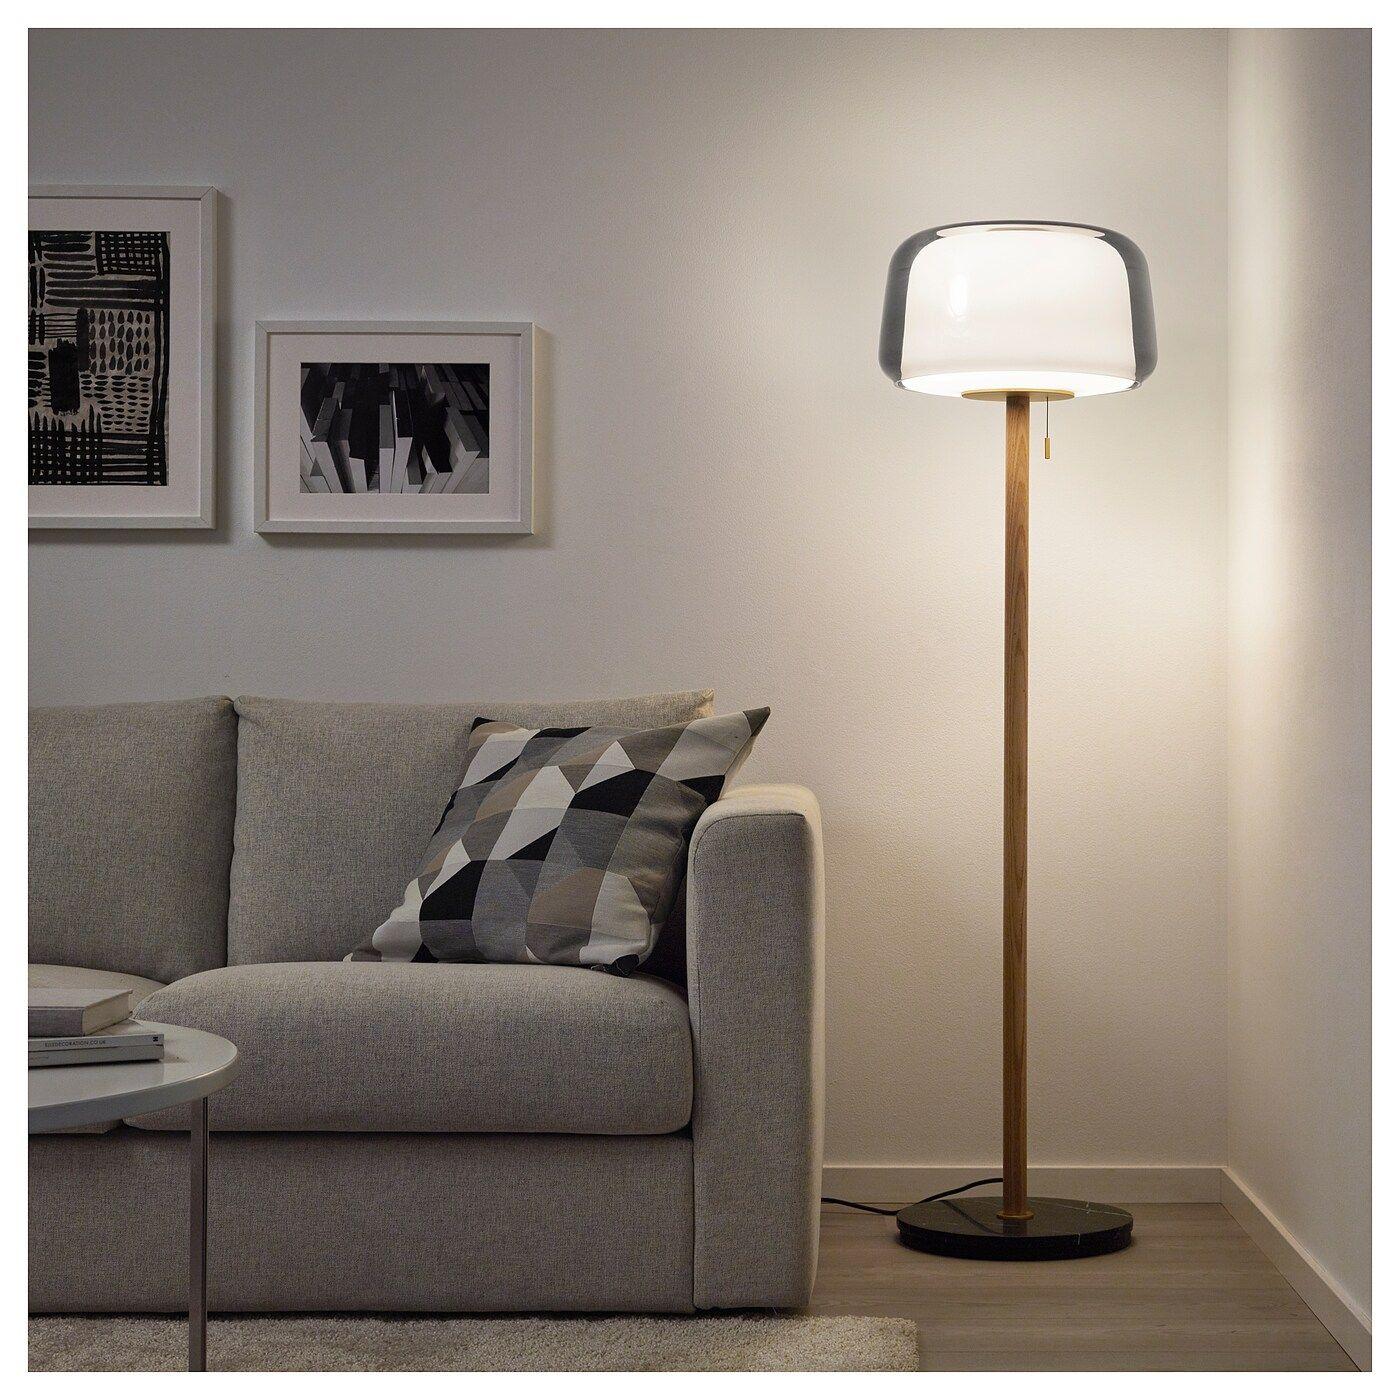 Evedal Floor Lamp With Led Bulb Marble Gray Gray En 2020 Lampadaire Marbre Gris Lampe Sur Pied